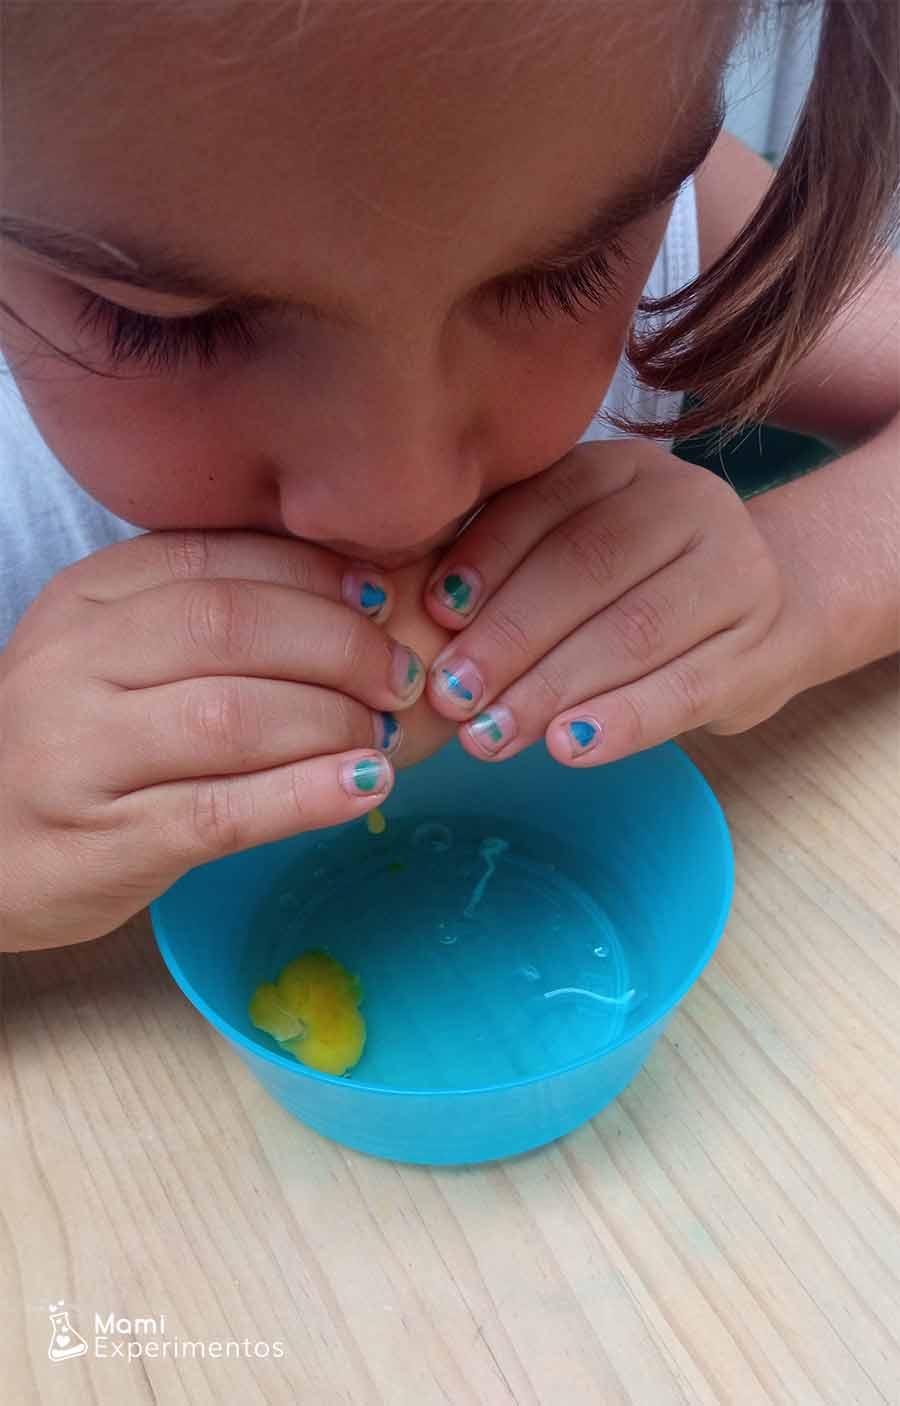 Dejando vacío huevo experimento huevo plateado